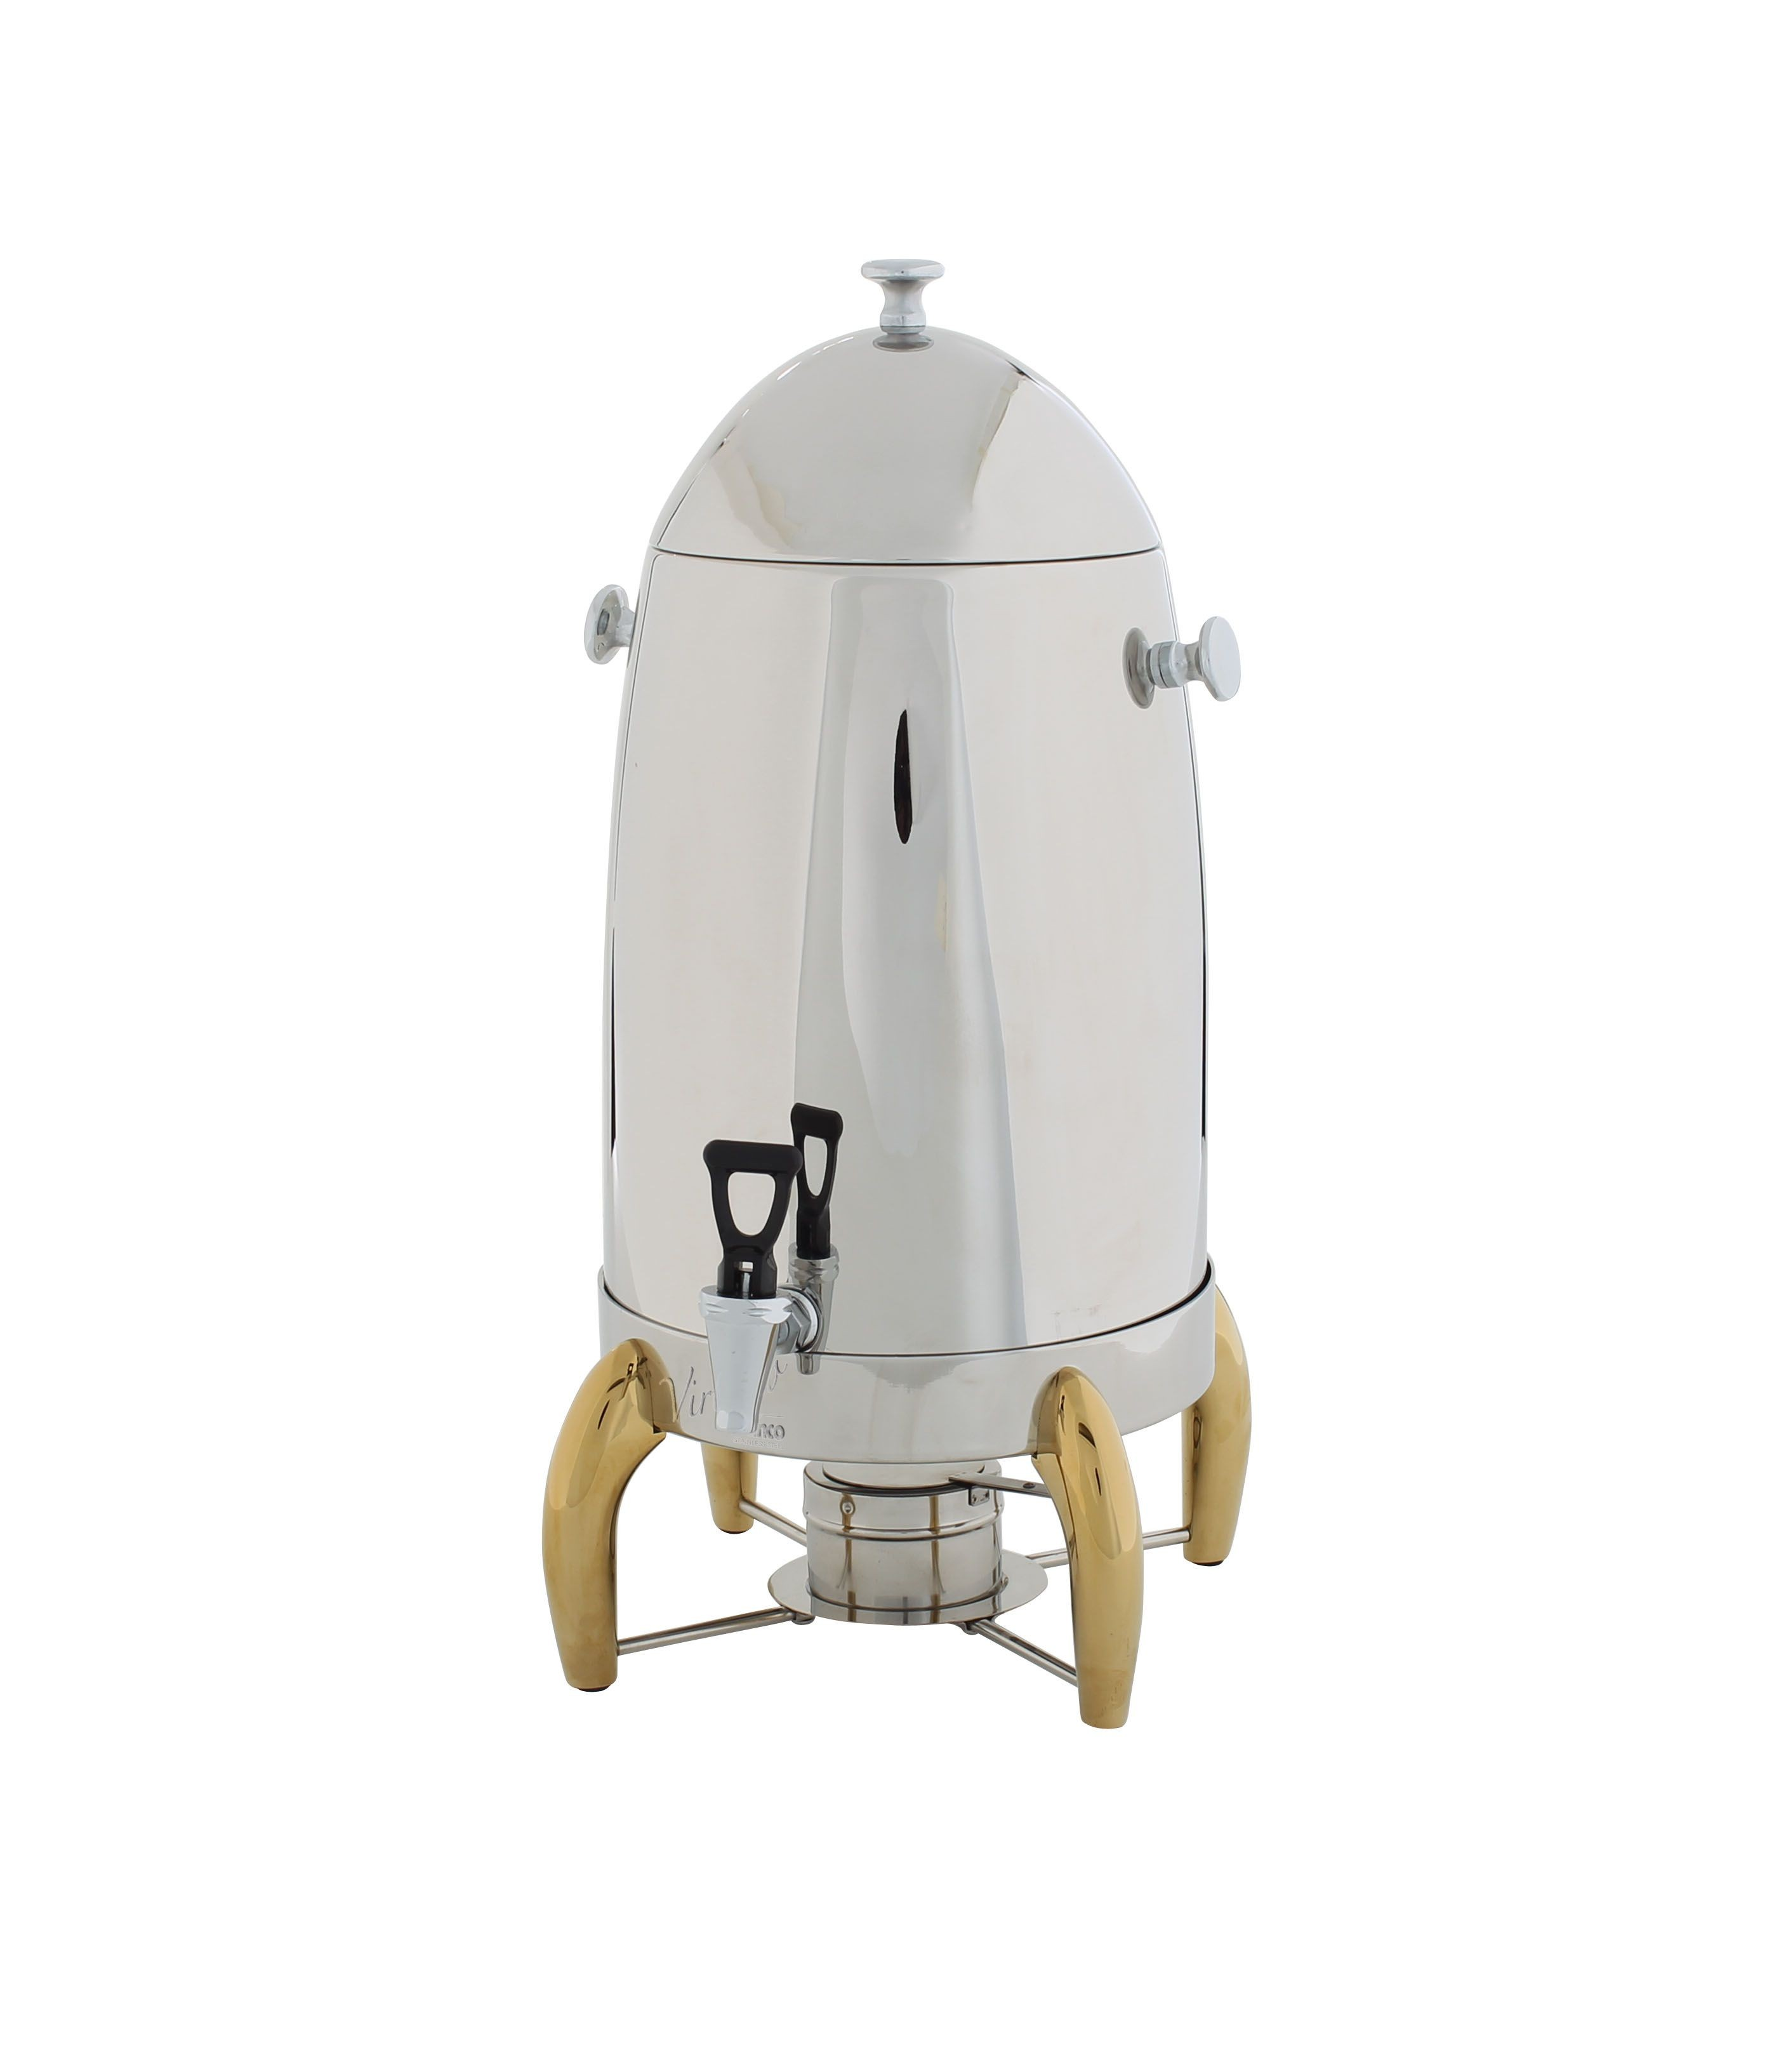 Virtuoso Coffee Urn with Gold Legs, 5 Gallon